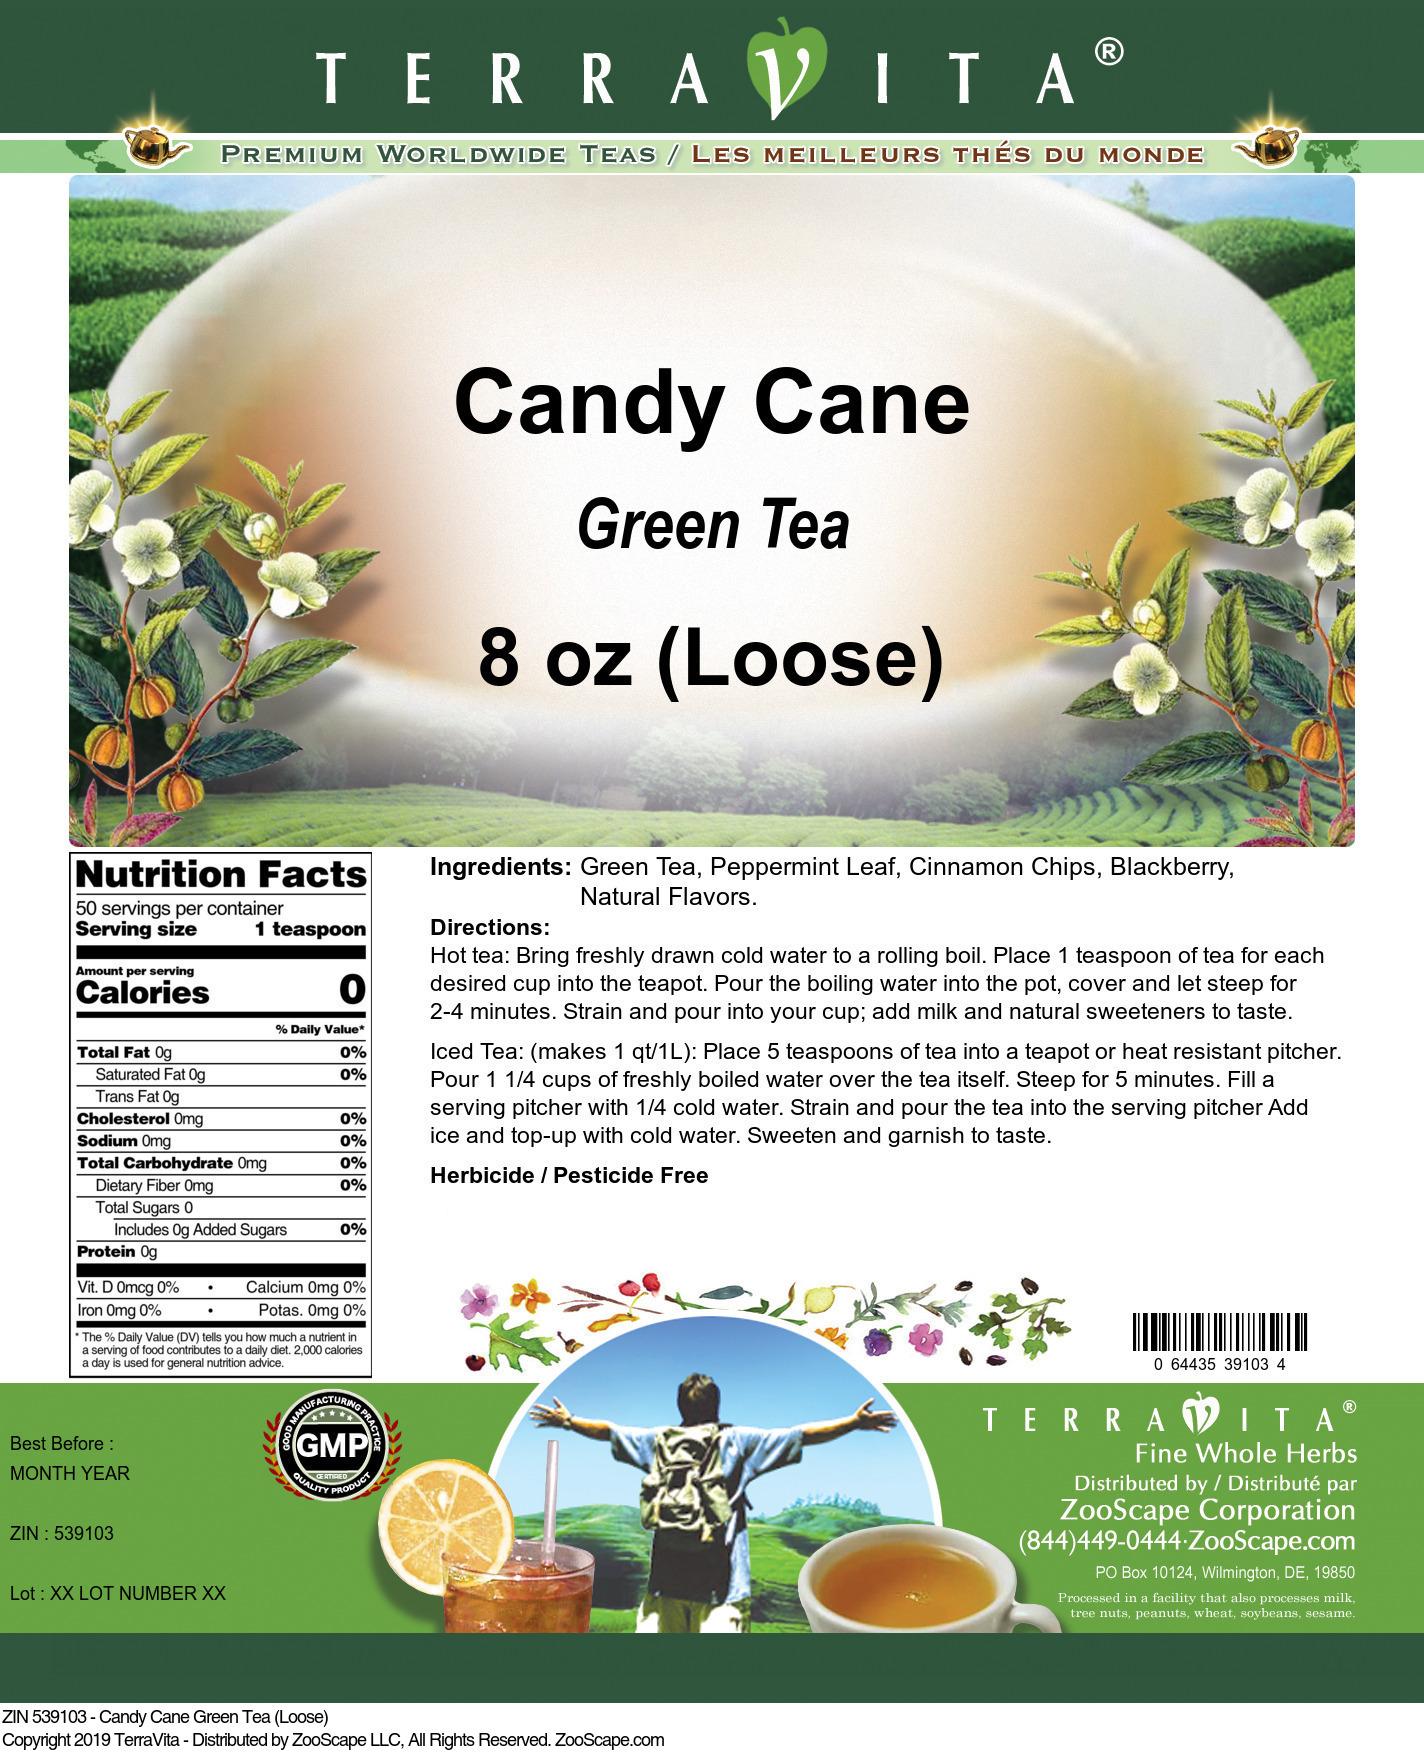 Candy Cane Green Tea (Loose)